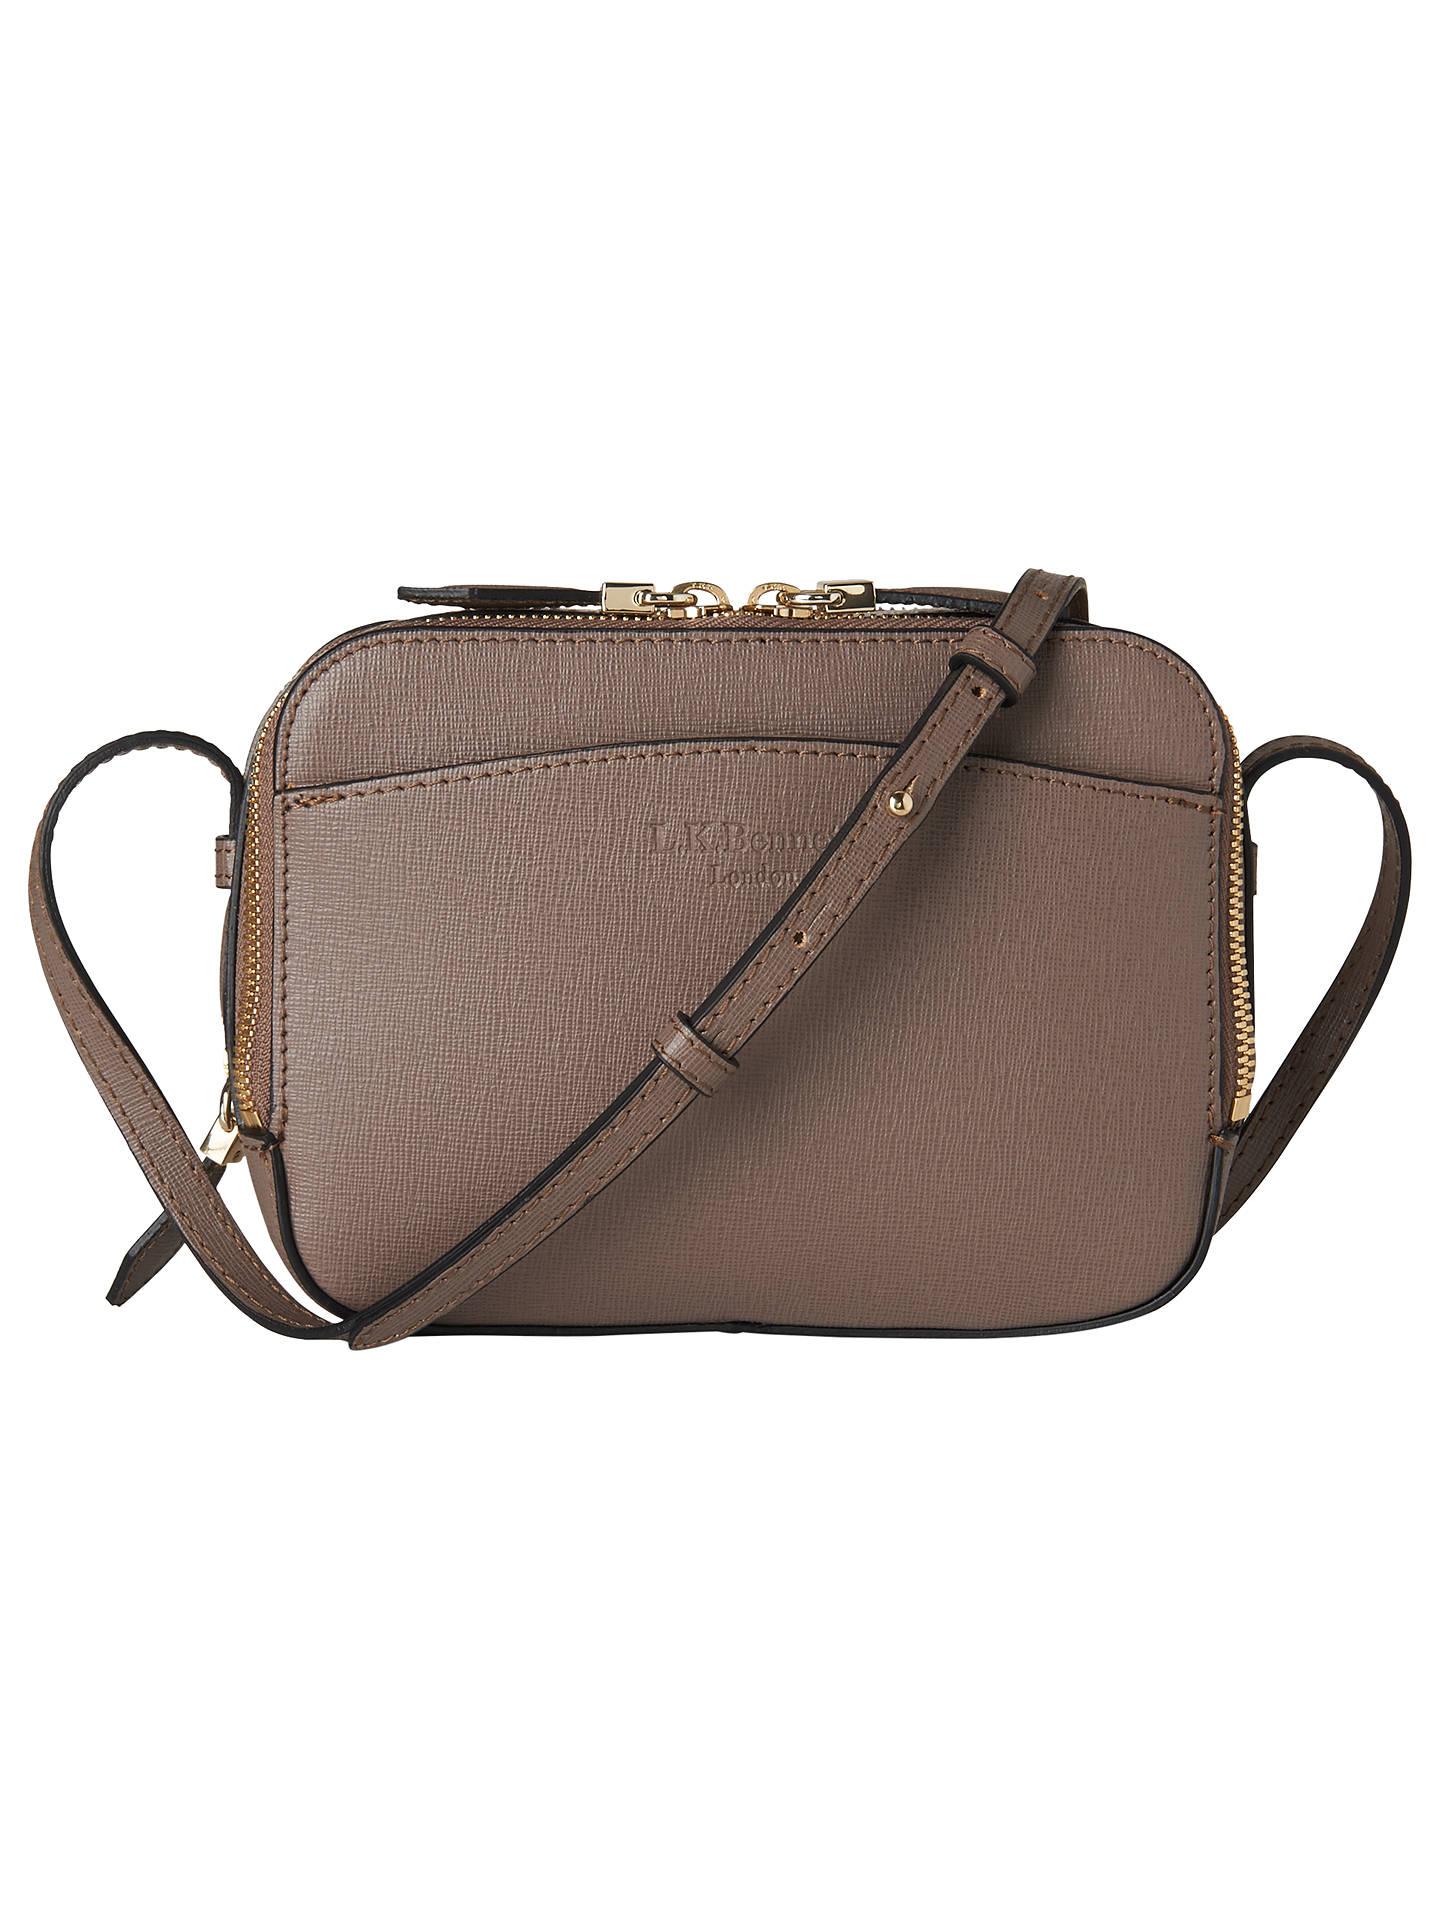 622ee9ba5be9 Buy L.K. Bennett Mariel Leather Across Body Bag, Grey Online at  johnlewis.com ...